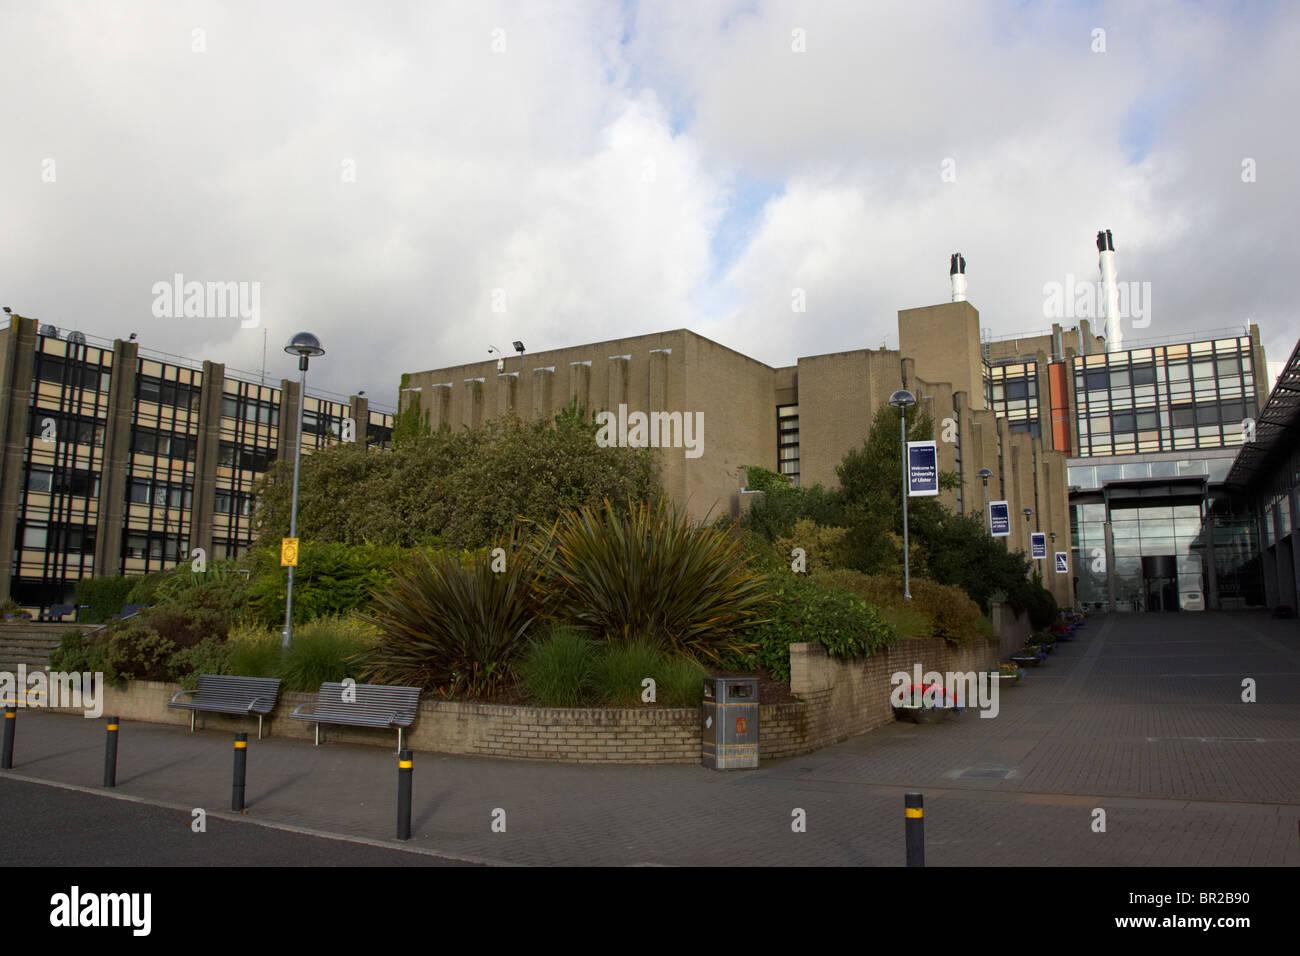 main building of the University of Ulster Jordanstown Campus Northern Ireland uk - Stock Image